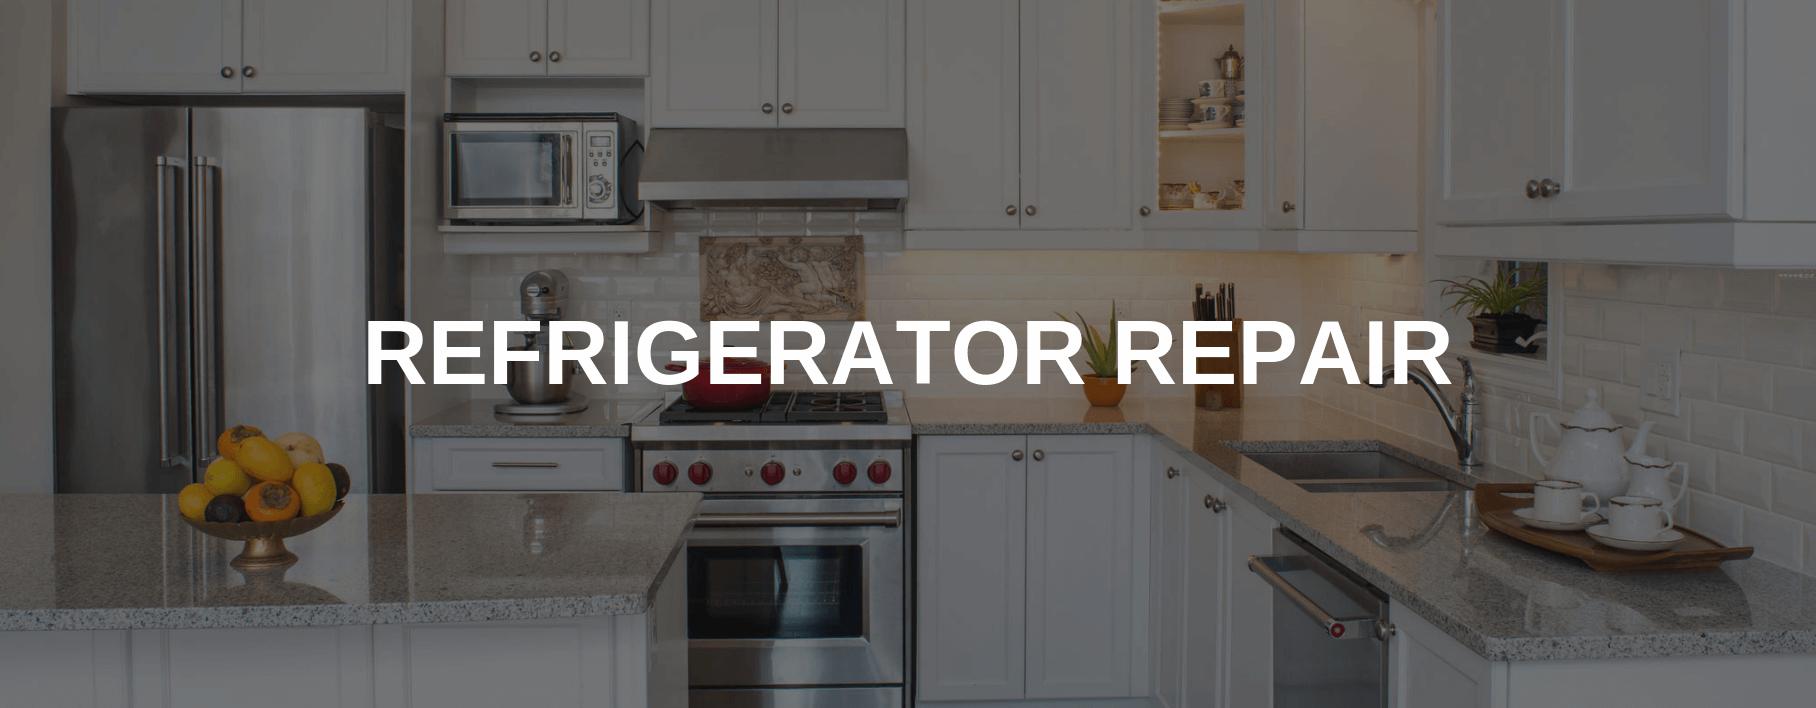 refrigerator repair concord